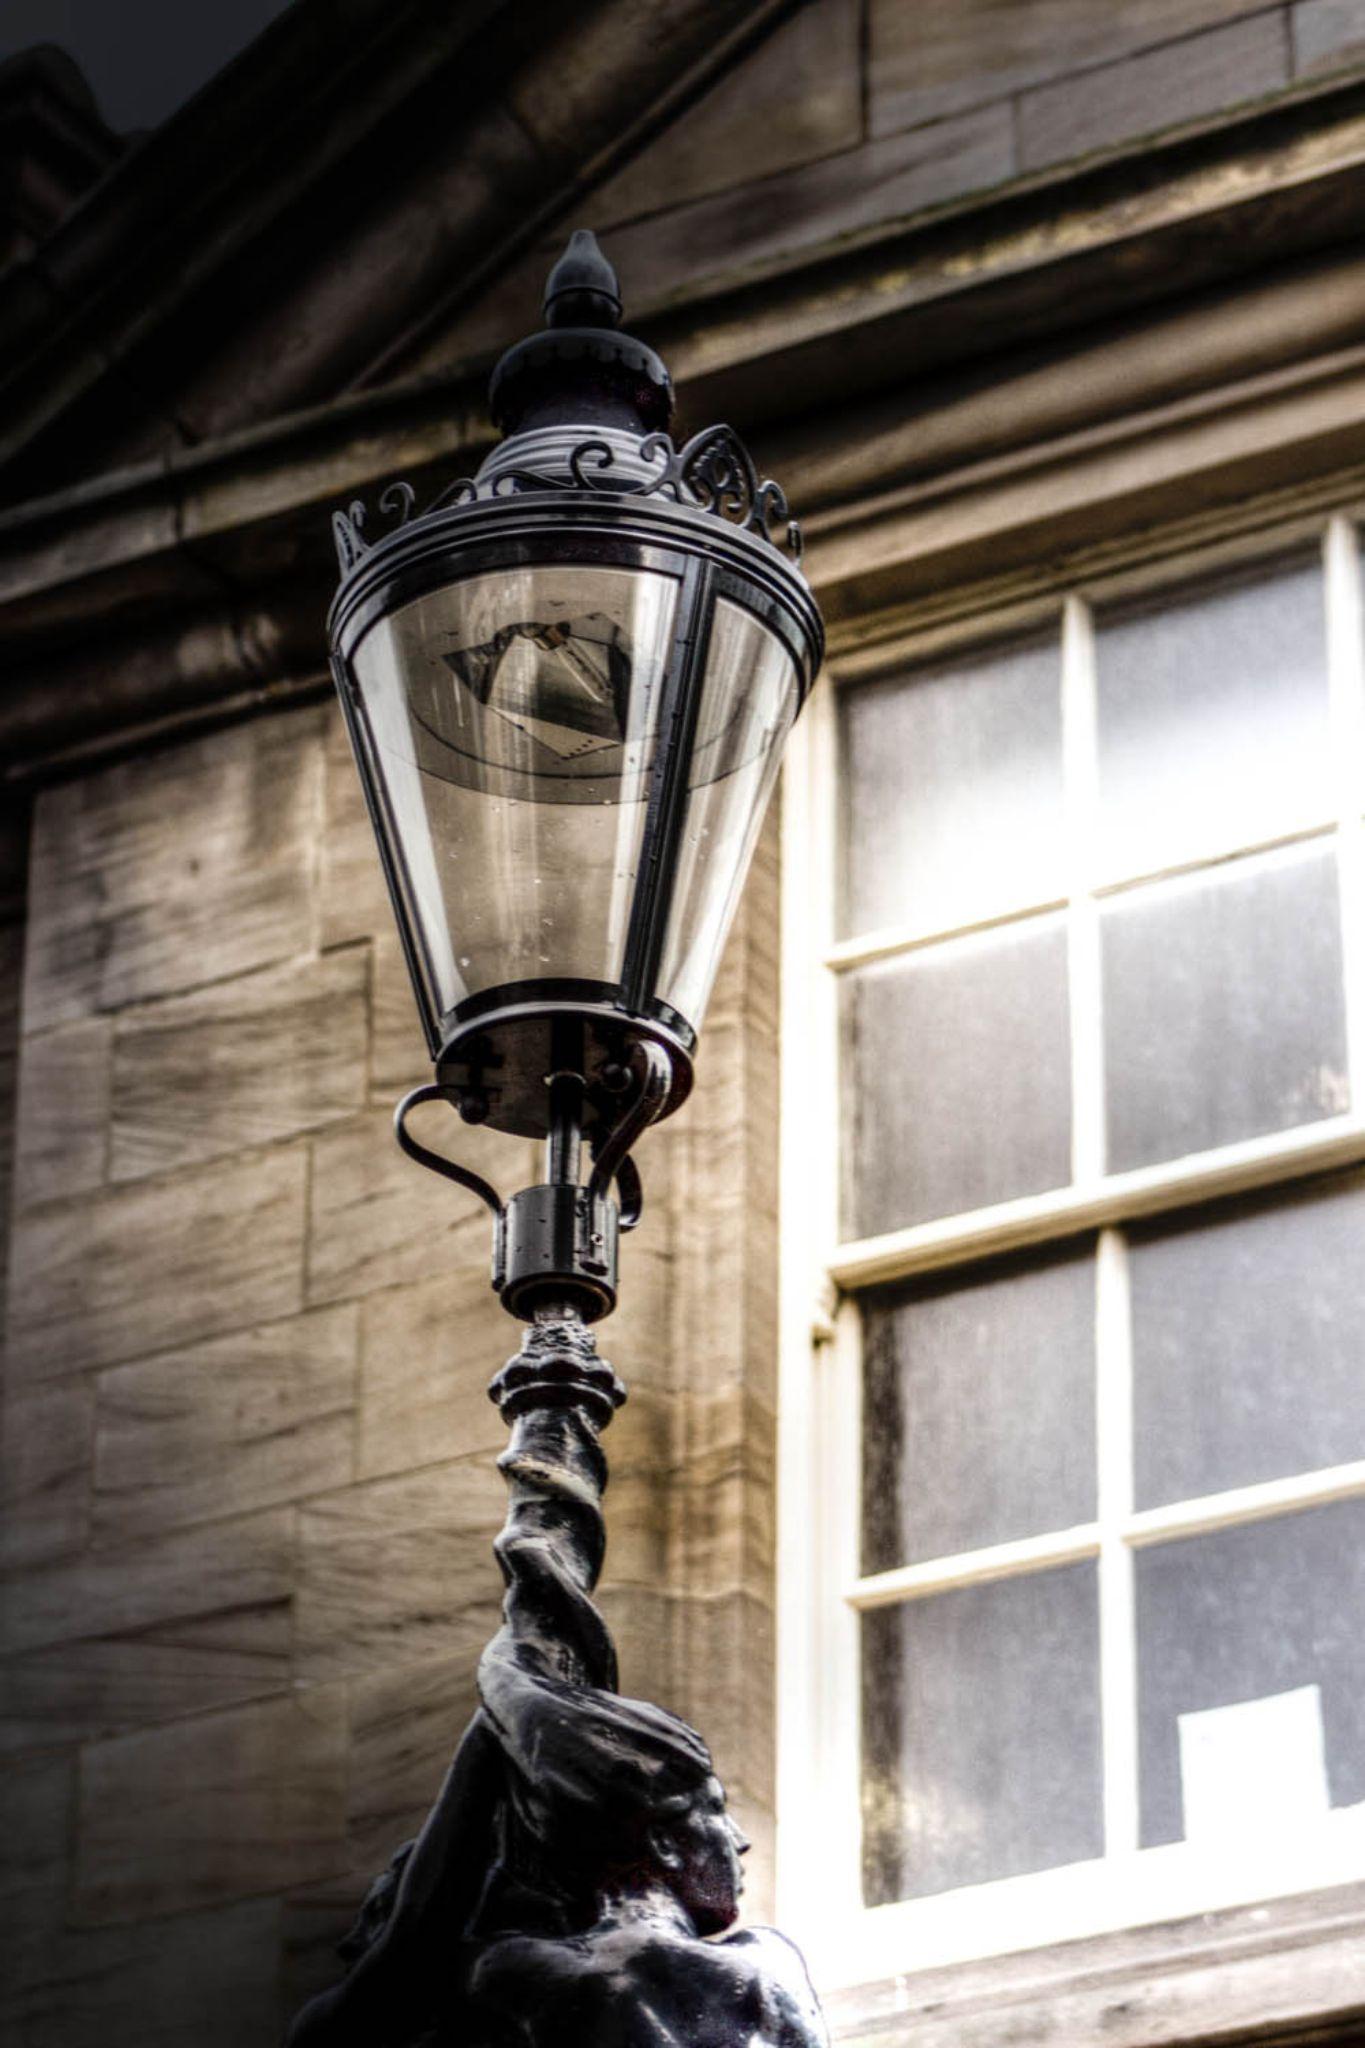 Light by my Window by crazydave53